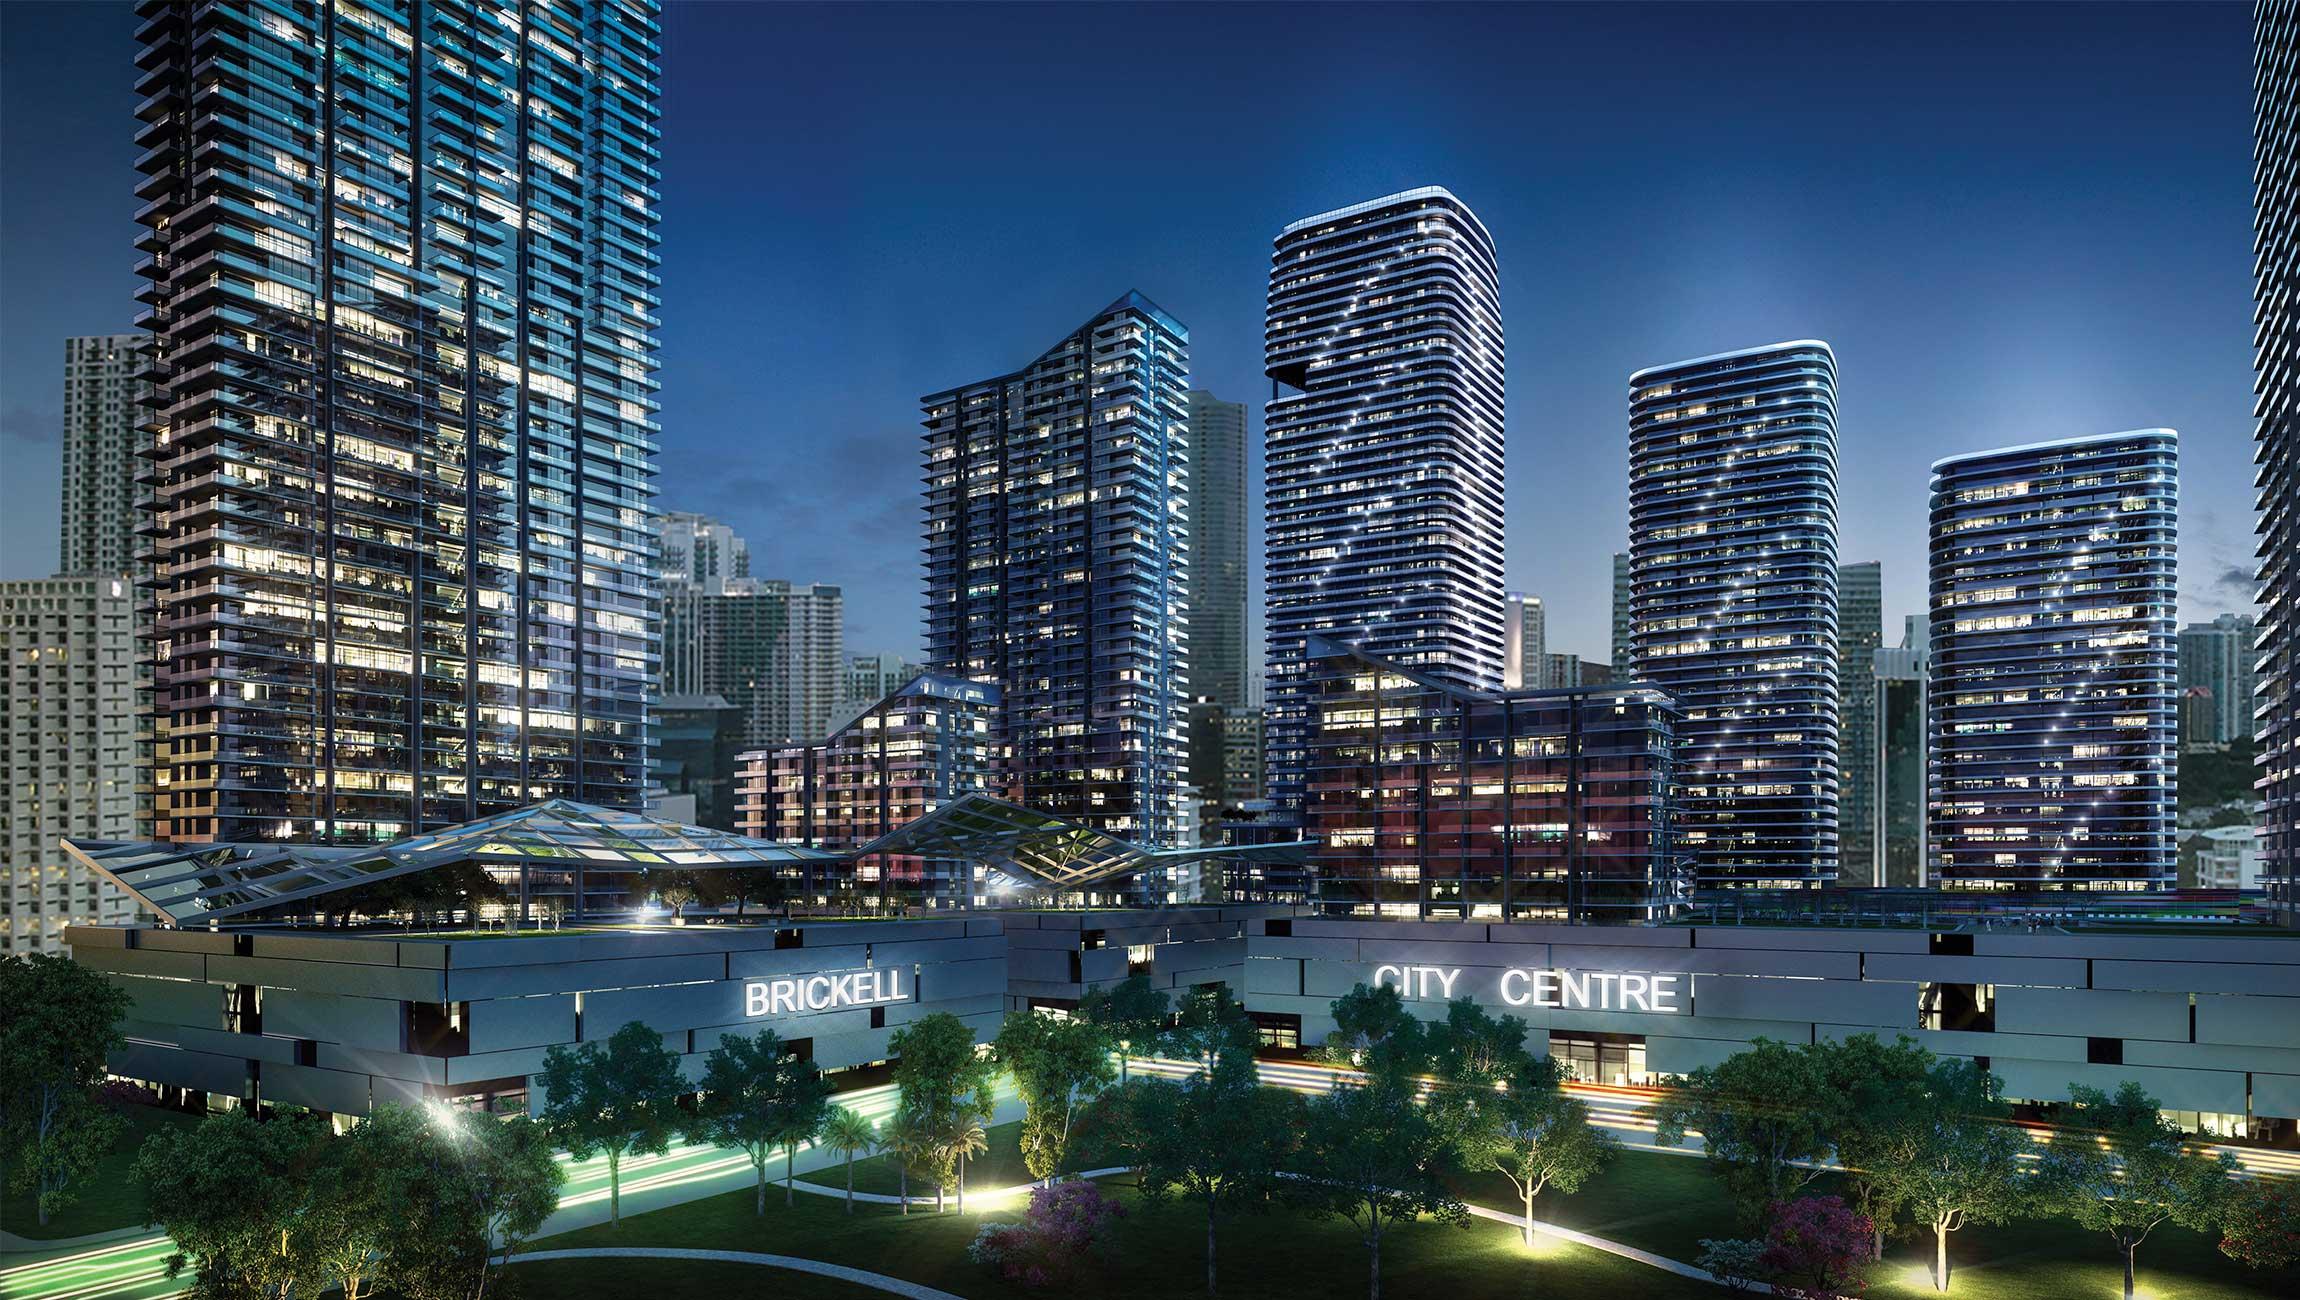 Slslux Nearby Brickell Citycenter New Build Homesnew